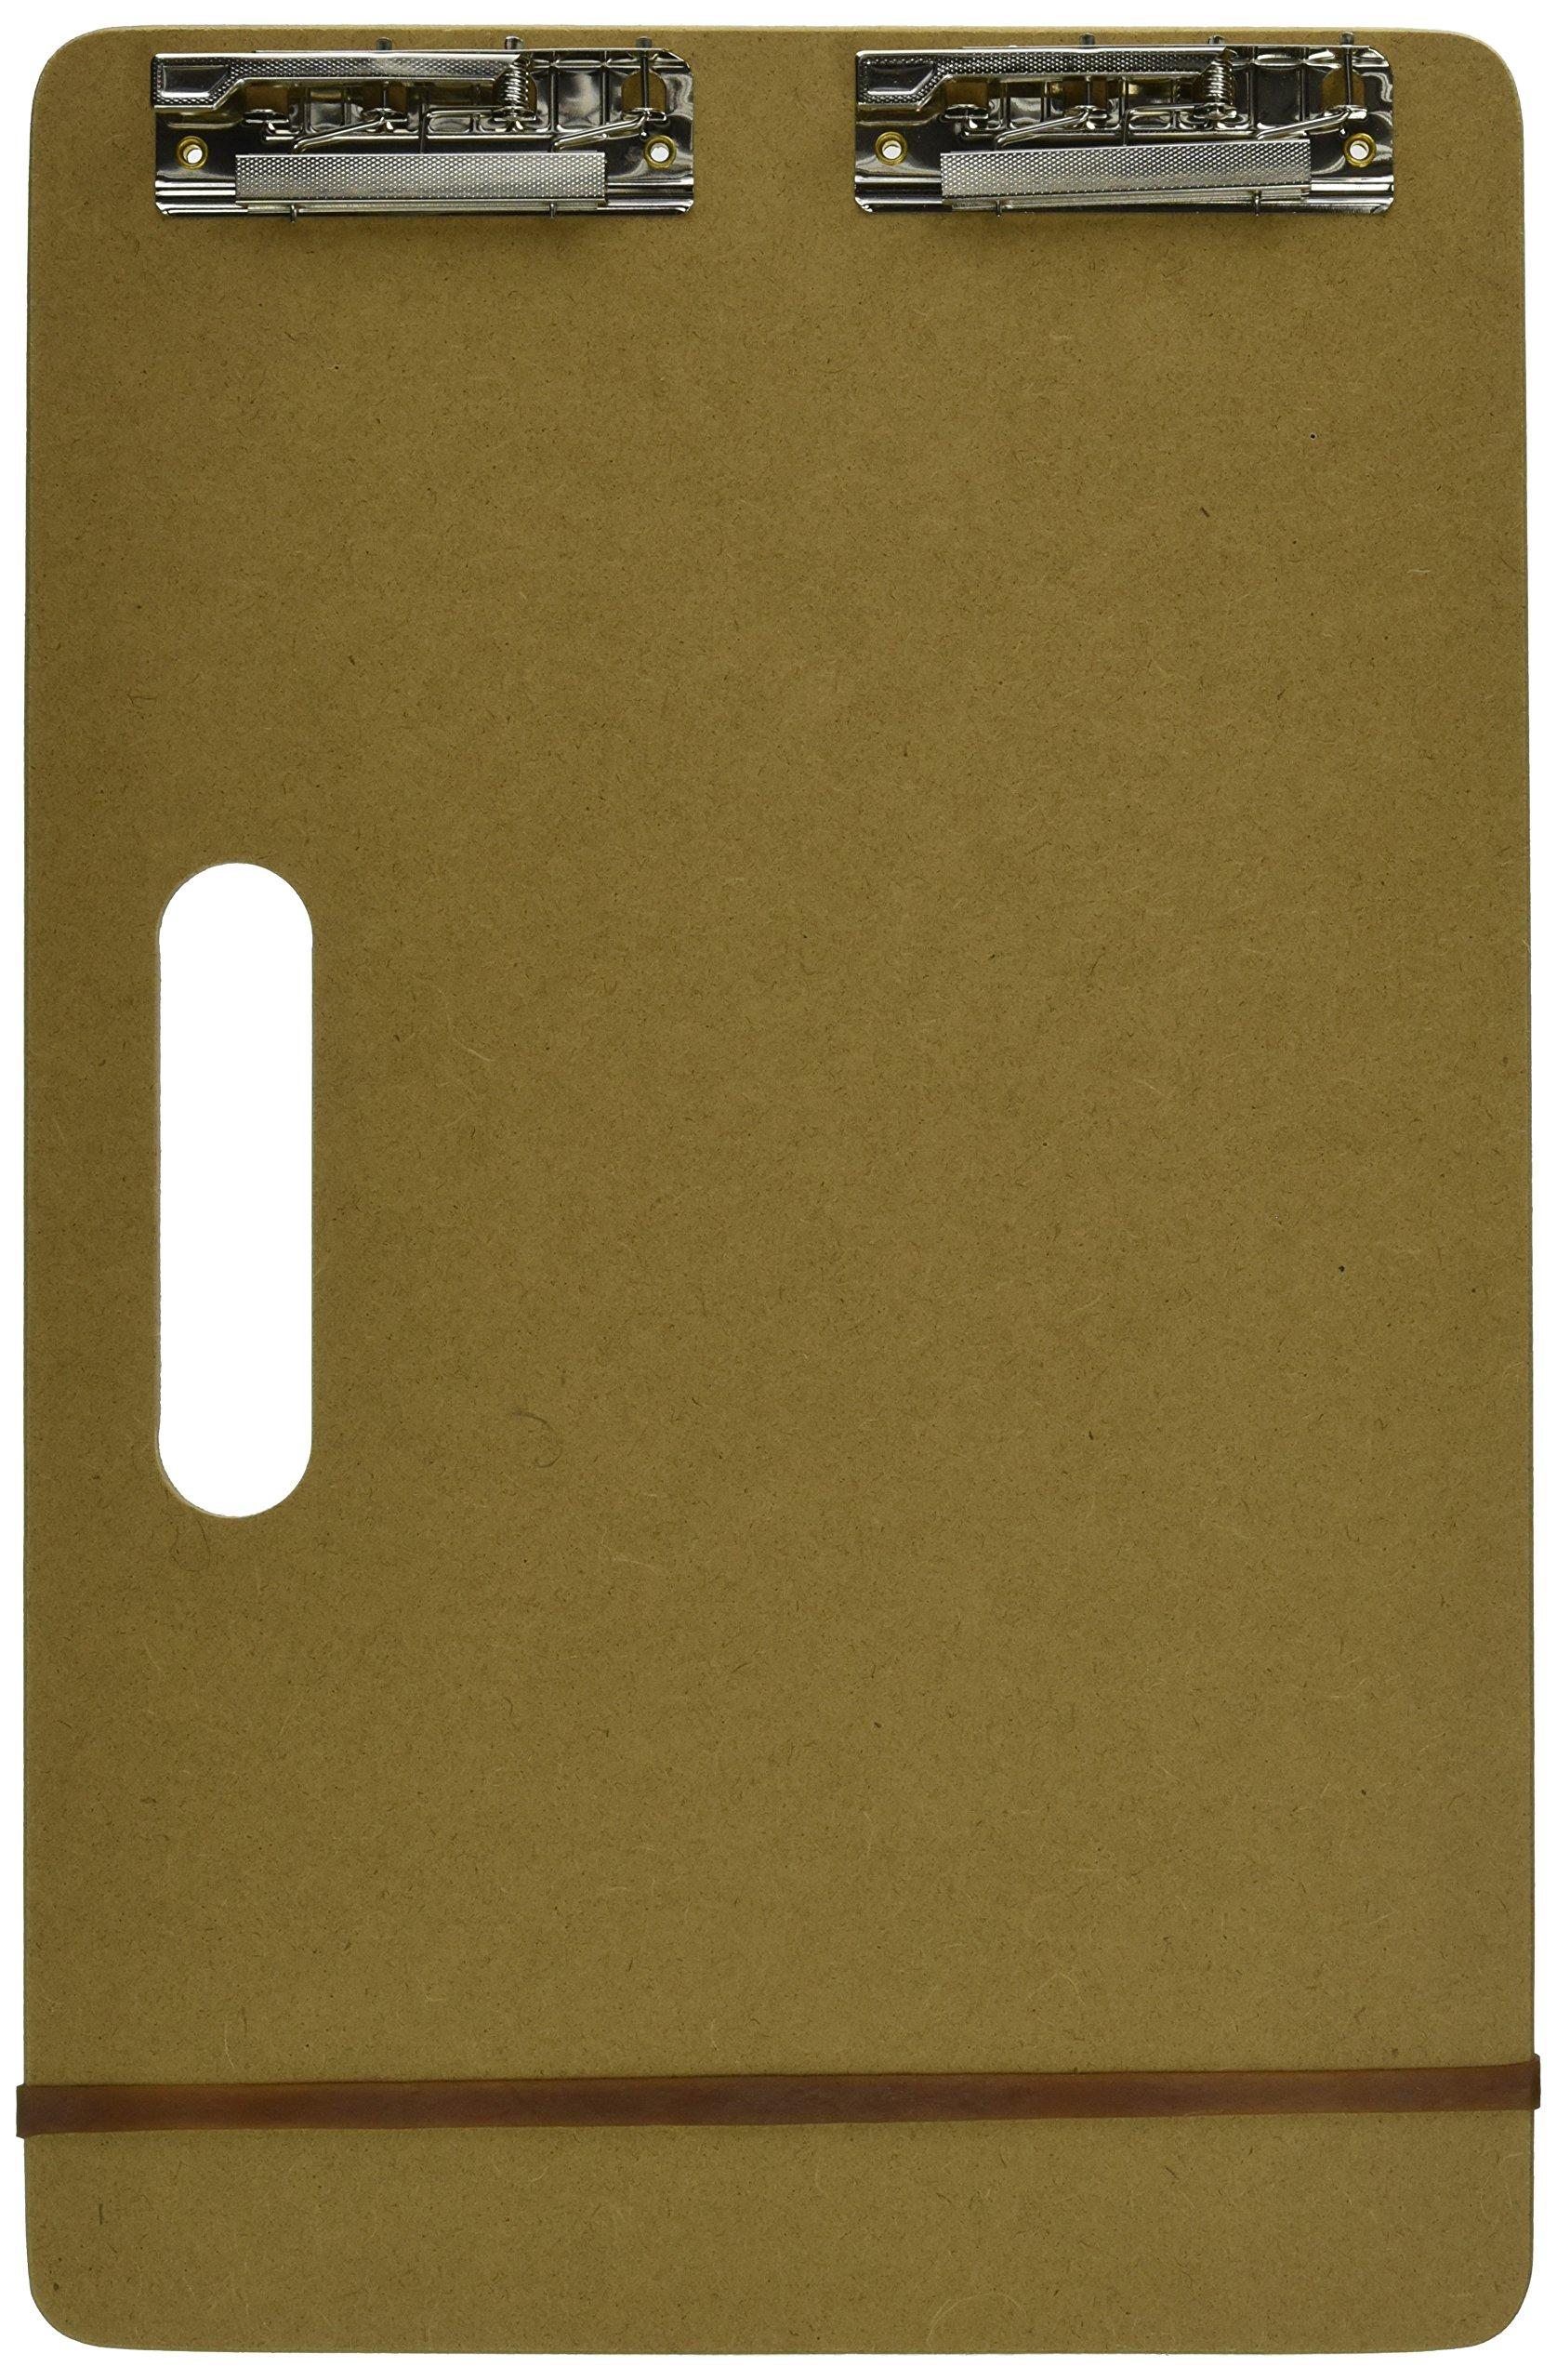 Jack Richeson 400410 Sketch Drawing Clip Board, 11 x 17